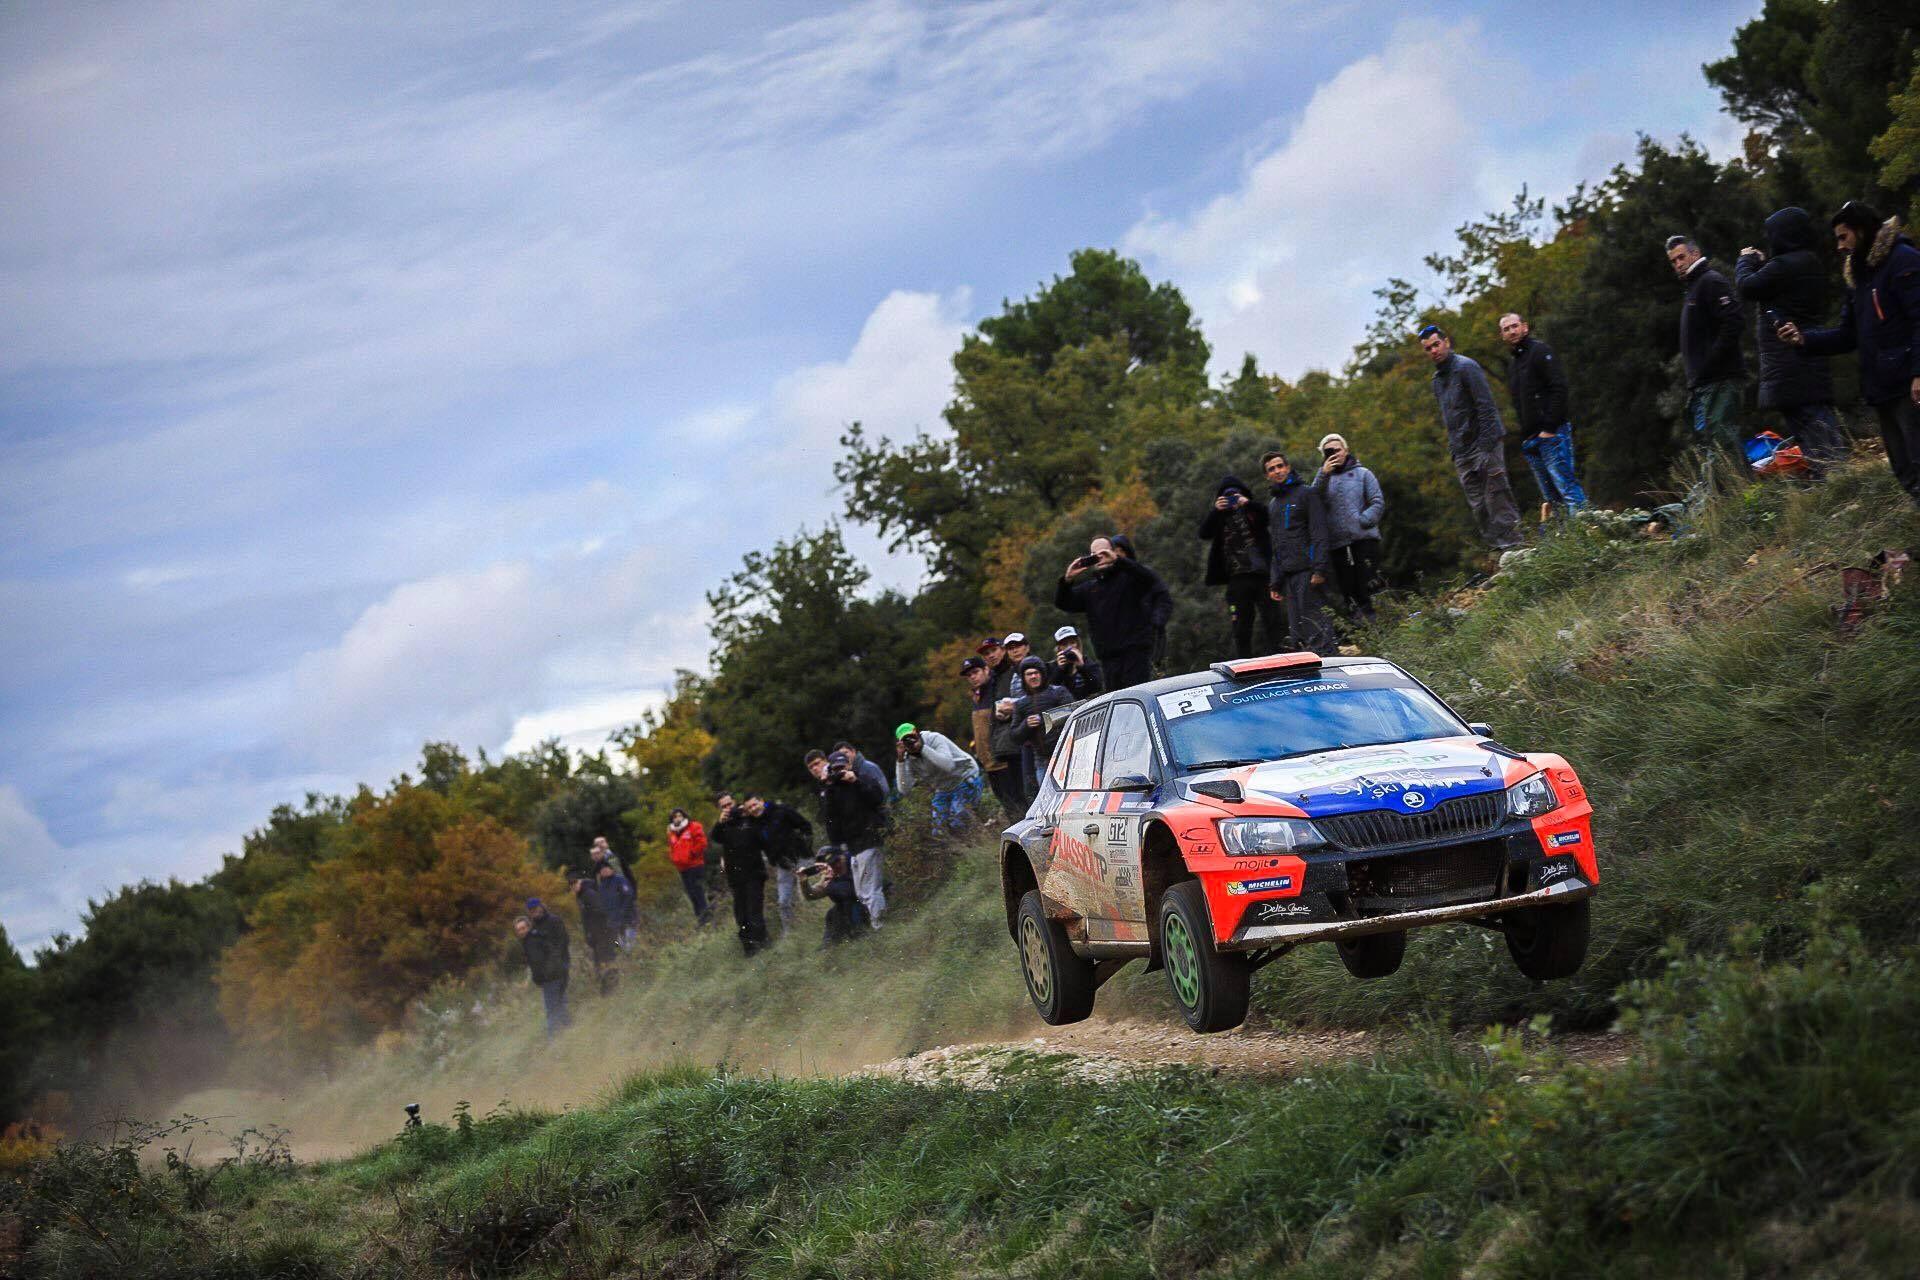 Calendrier Michelin AsphalteTerre 2019 Asphalte, Rallye